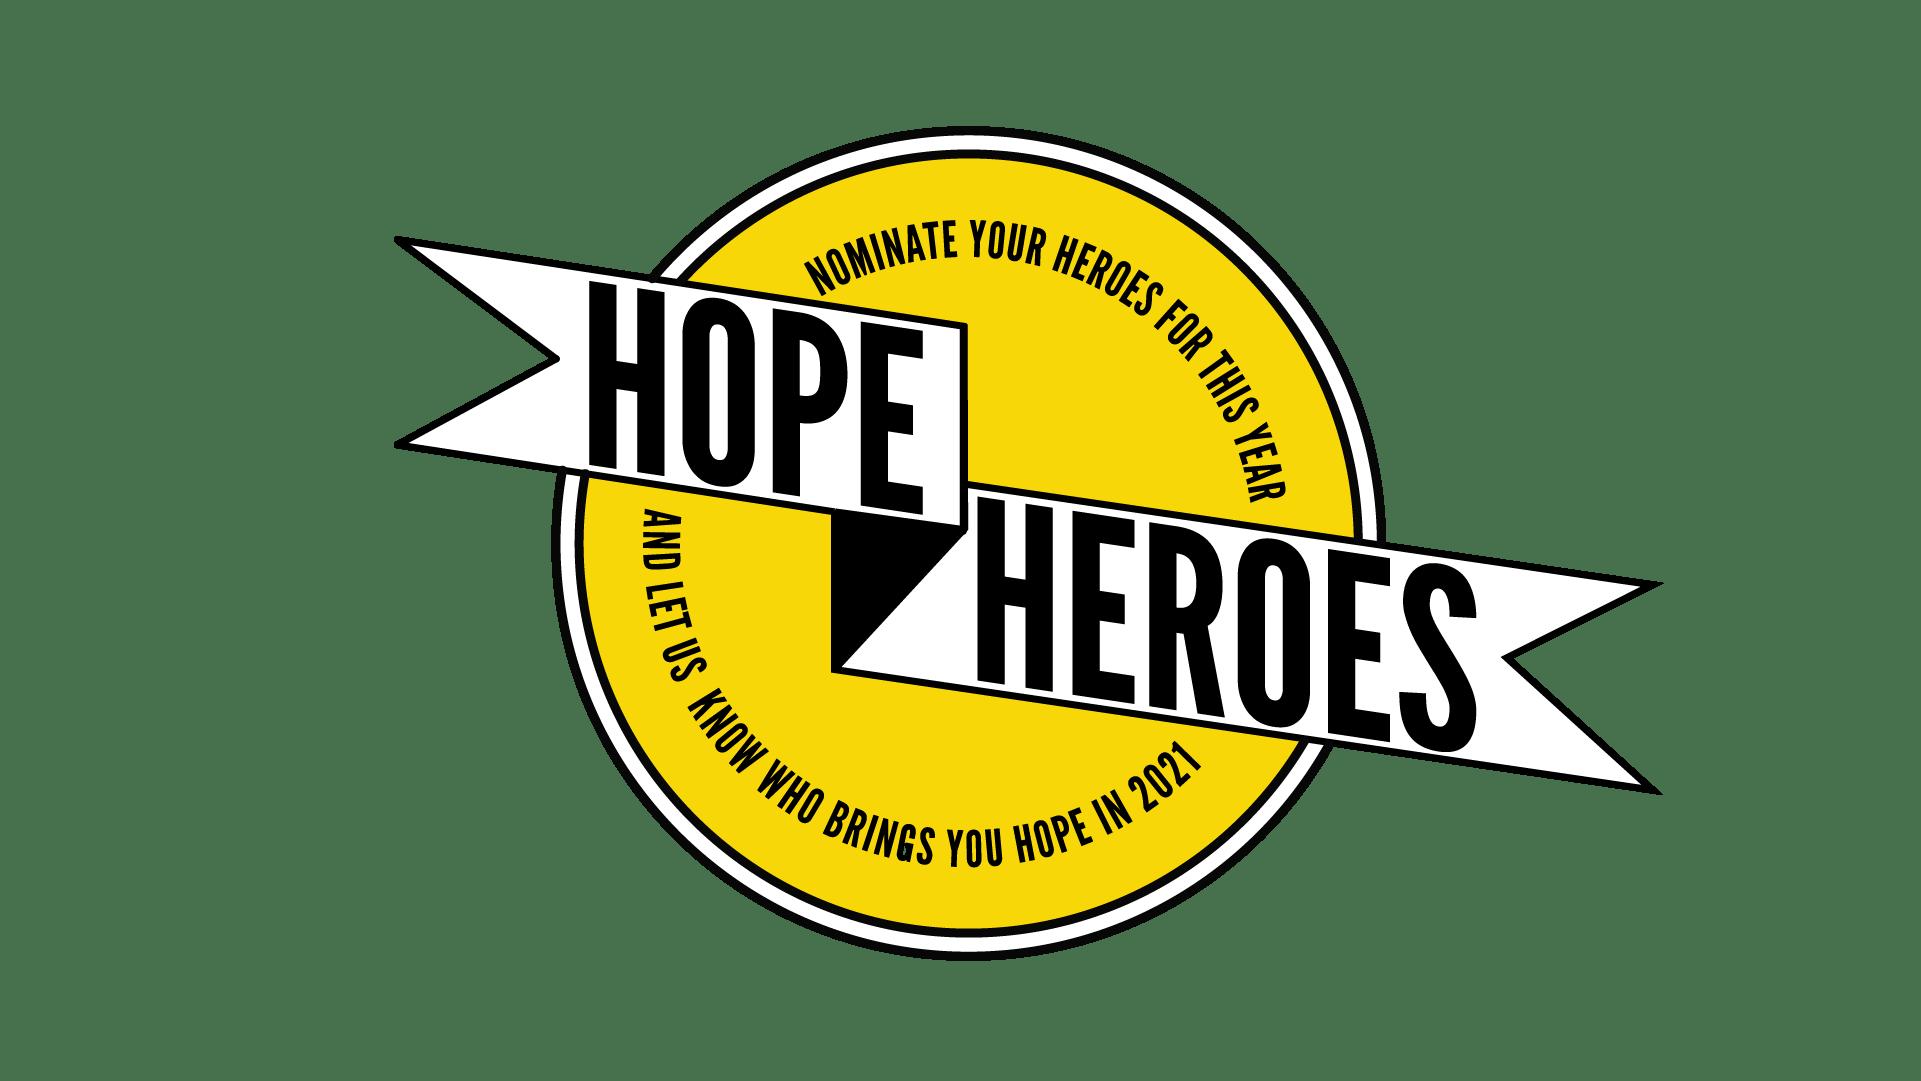 HOPE heroes nomination